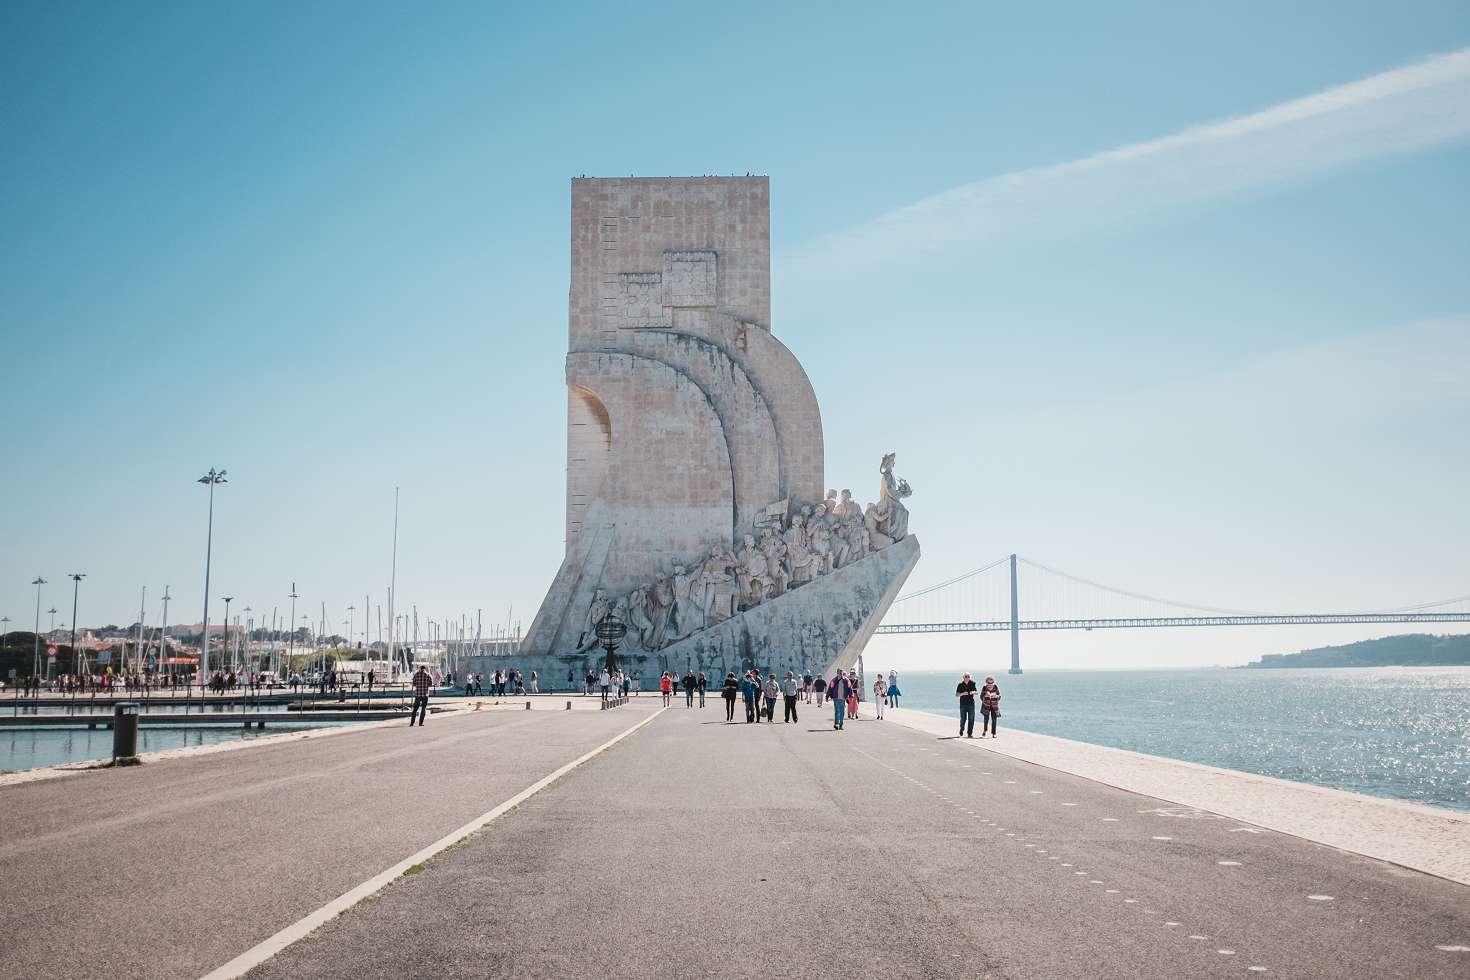 Valencia-Lissabon-Vigo-Stonehenge (18)